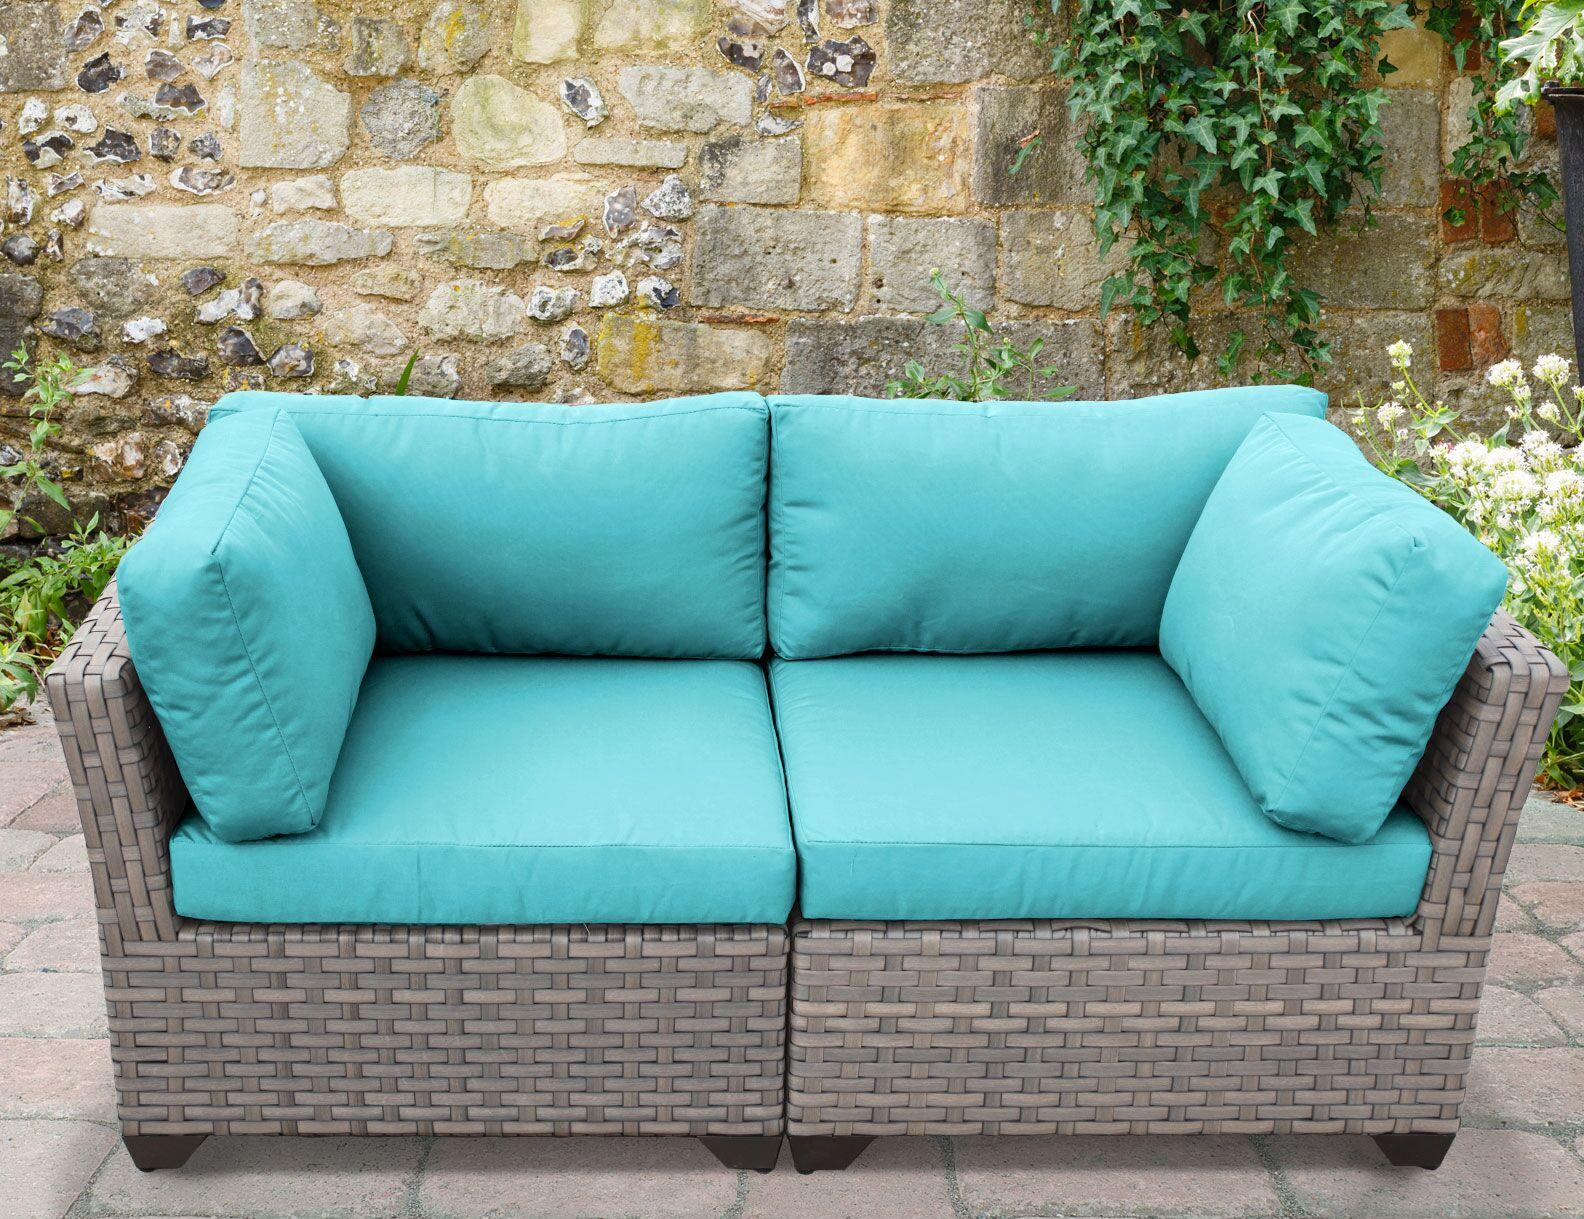 Monterey 2 Piece Conversation Set with Cushions Fabric: Aruba